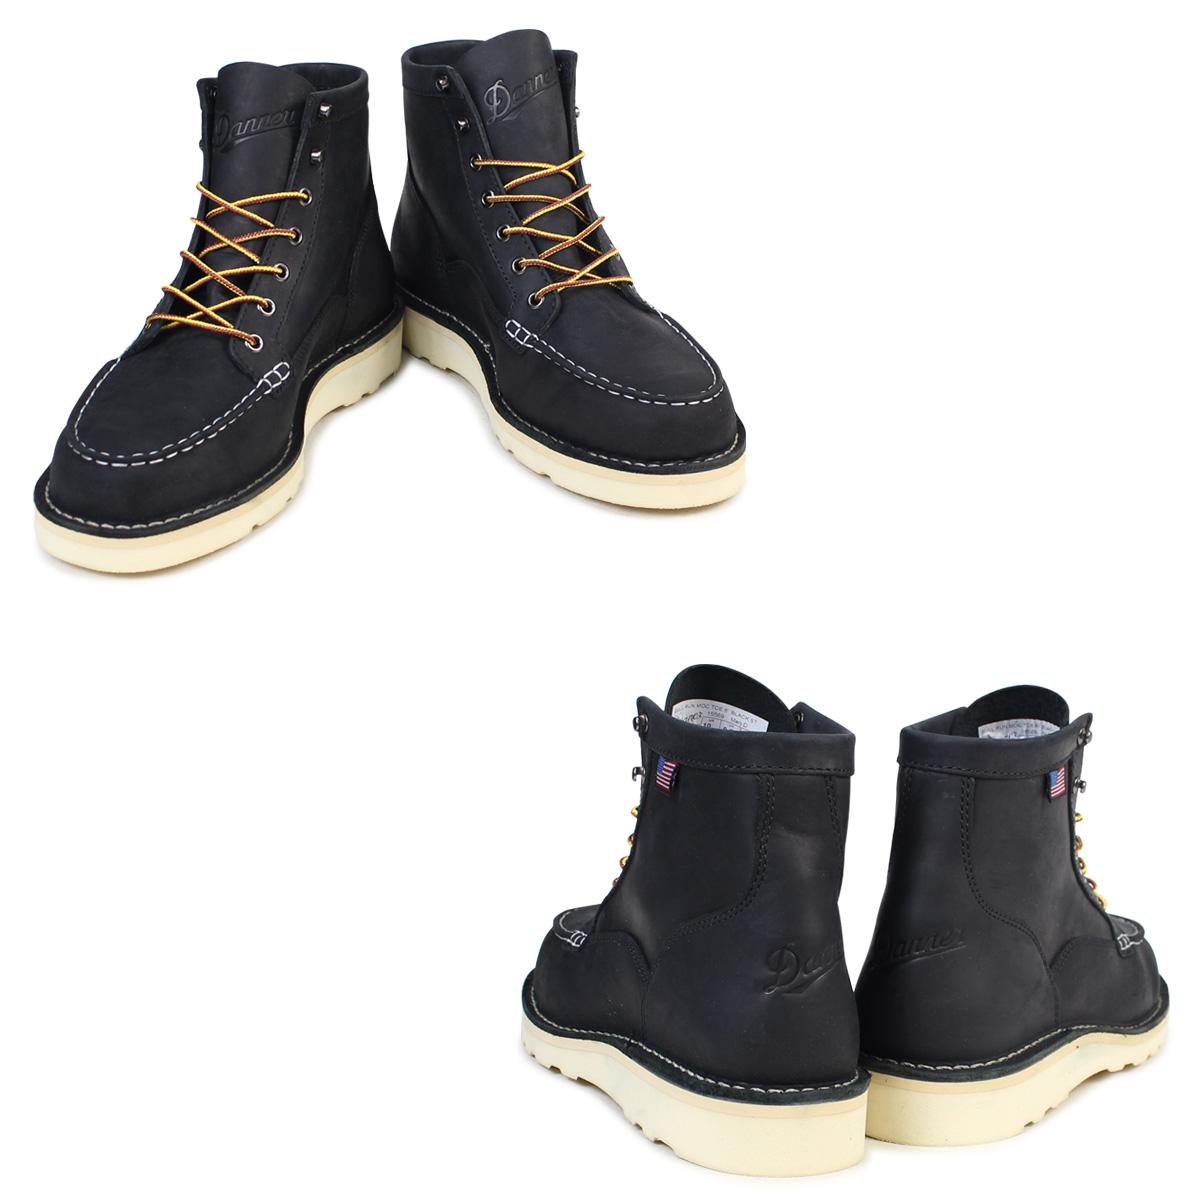 7fa558236a1 Danner boots Danner BULL RUN MOC TOE 6INCH 15569 EE Wise men black